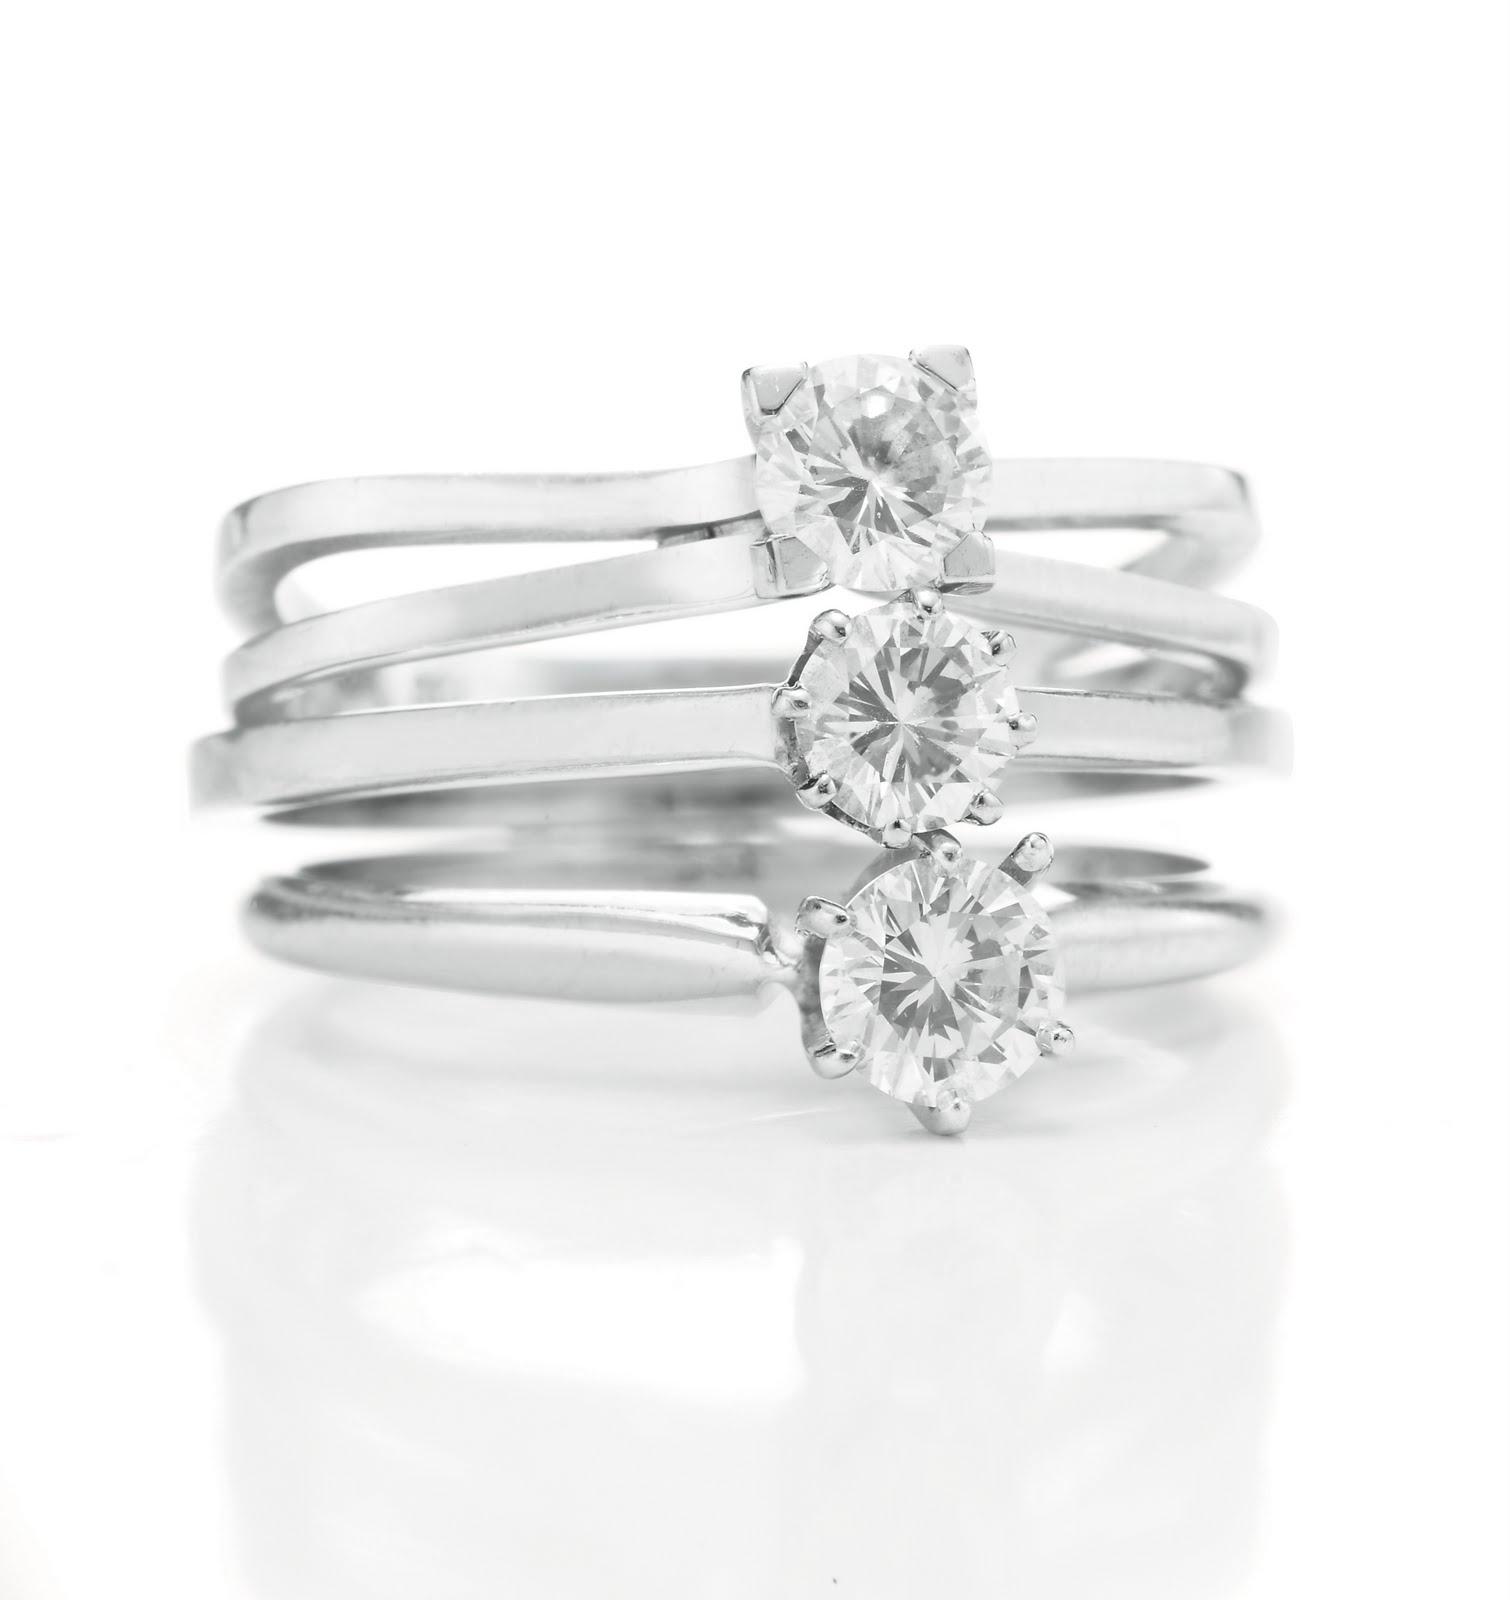 Van Cleef Wedding Bands 73 Amazing Ping Pong Diamond Rings